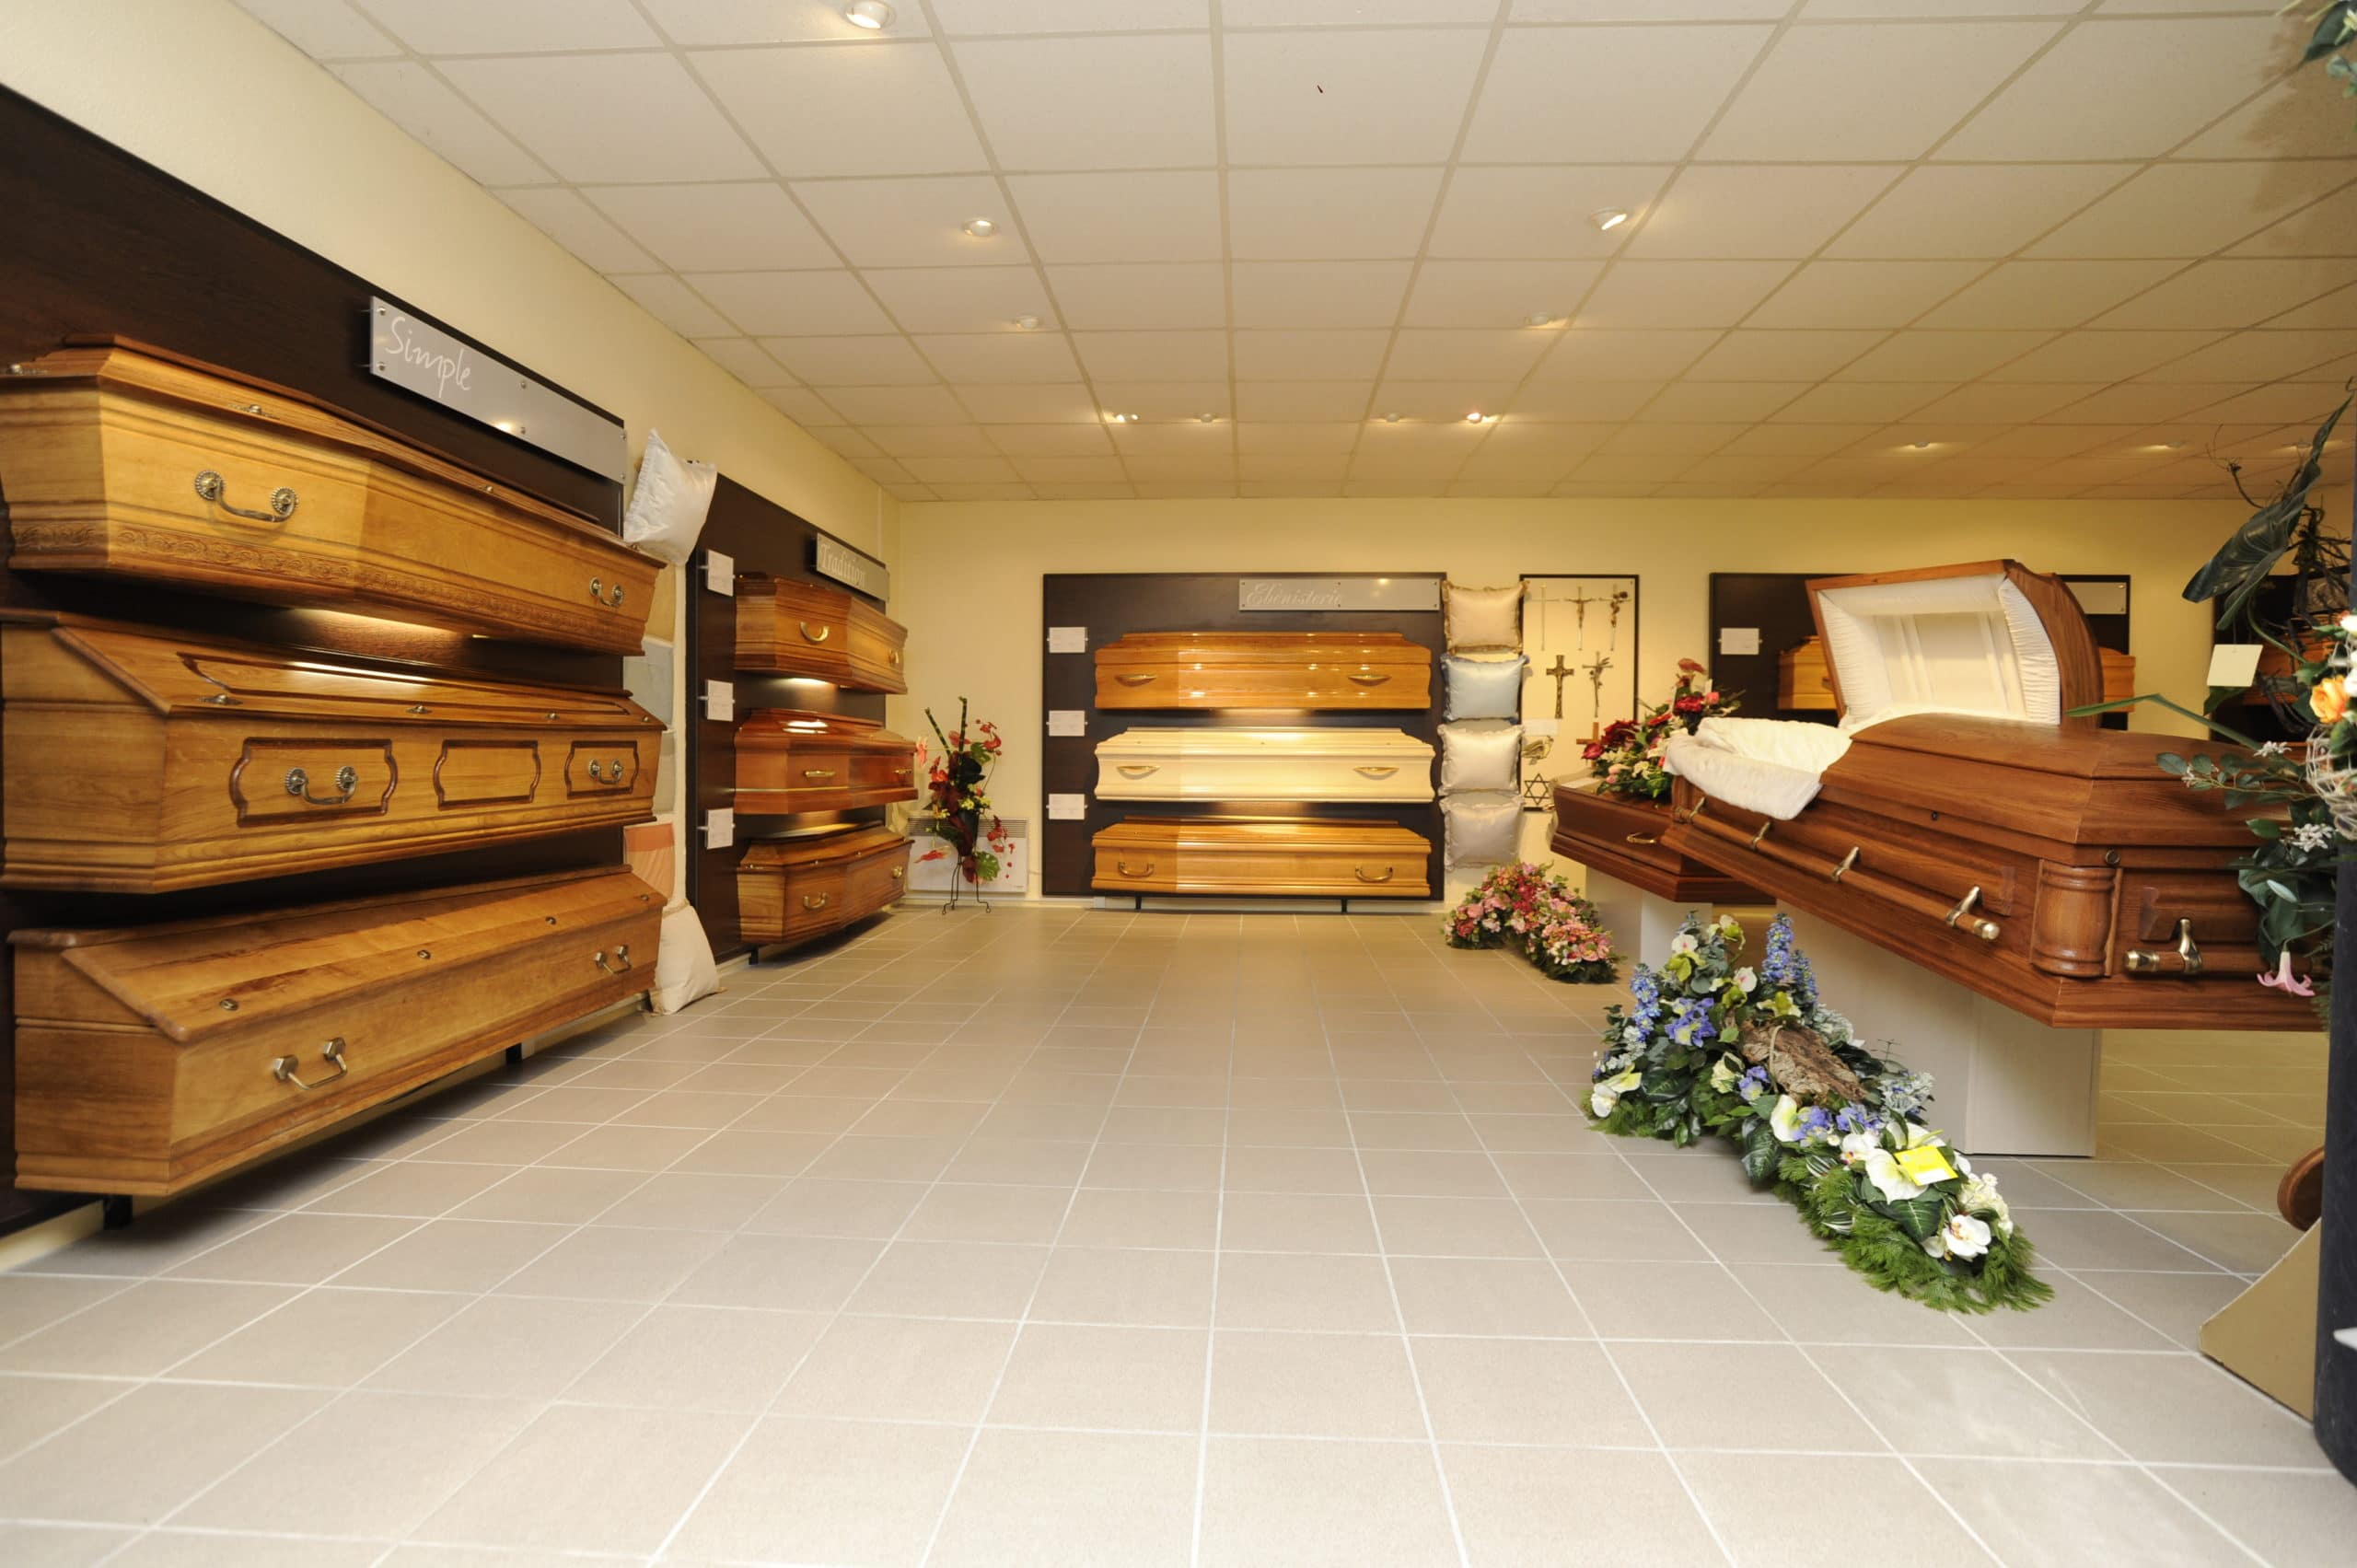 Service pompes funebres